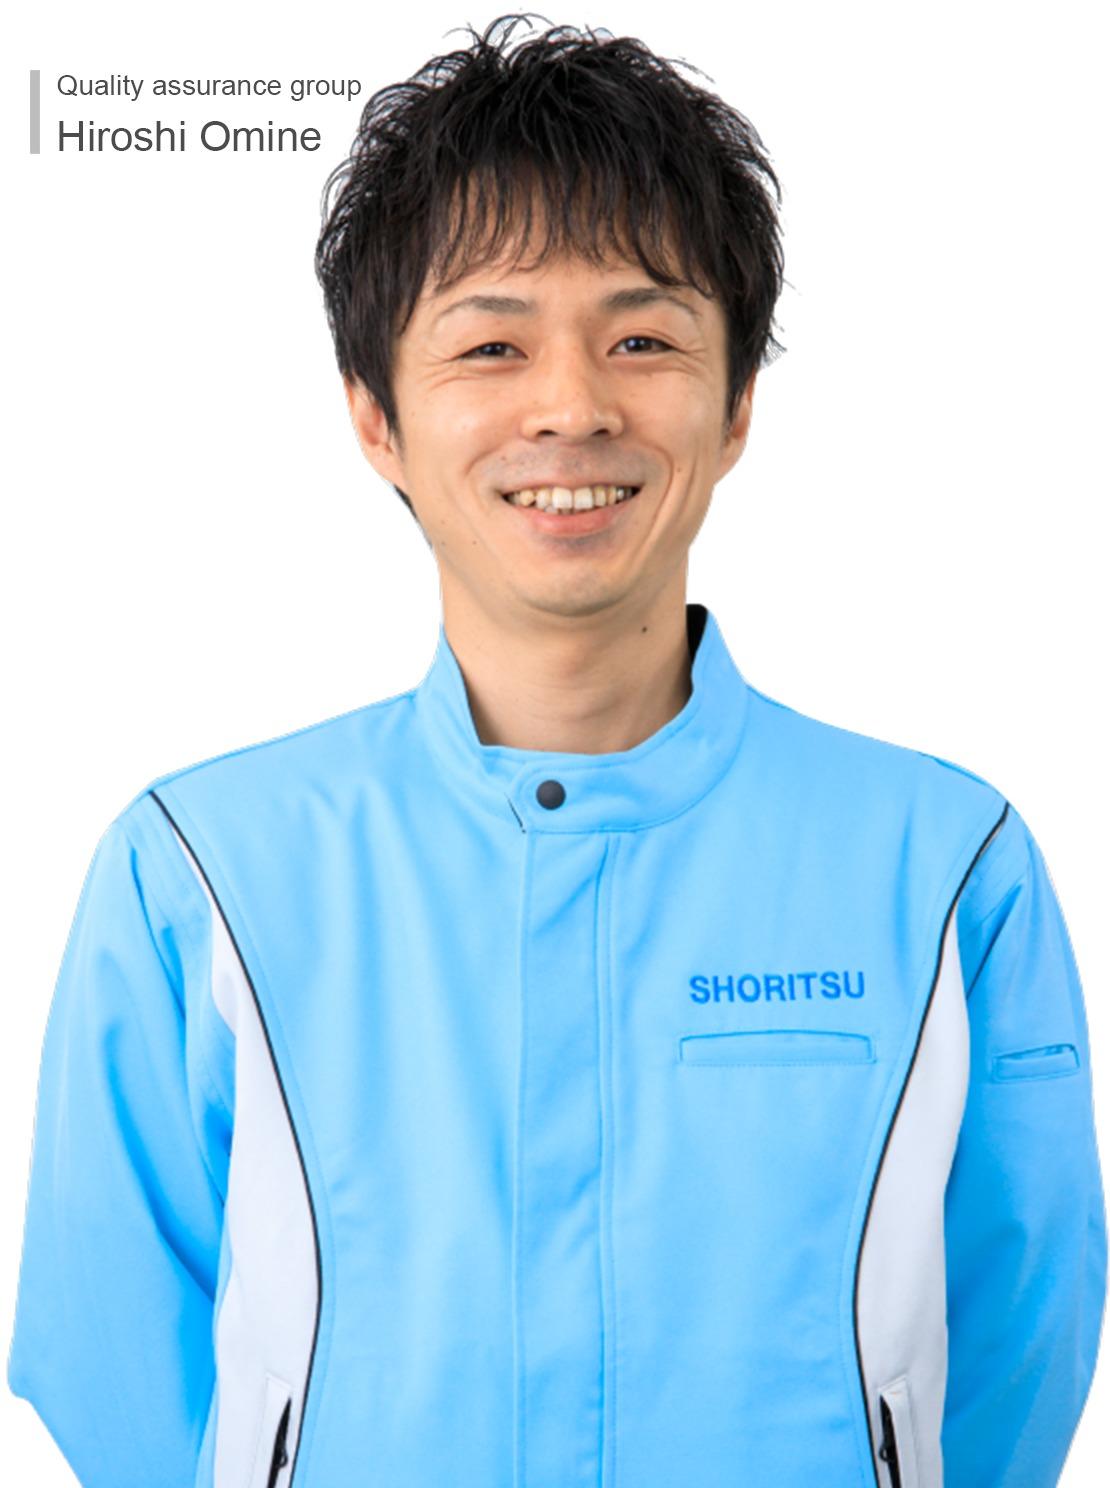 Quality assurance group Hiroshi Omine